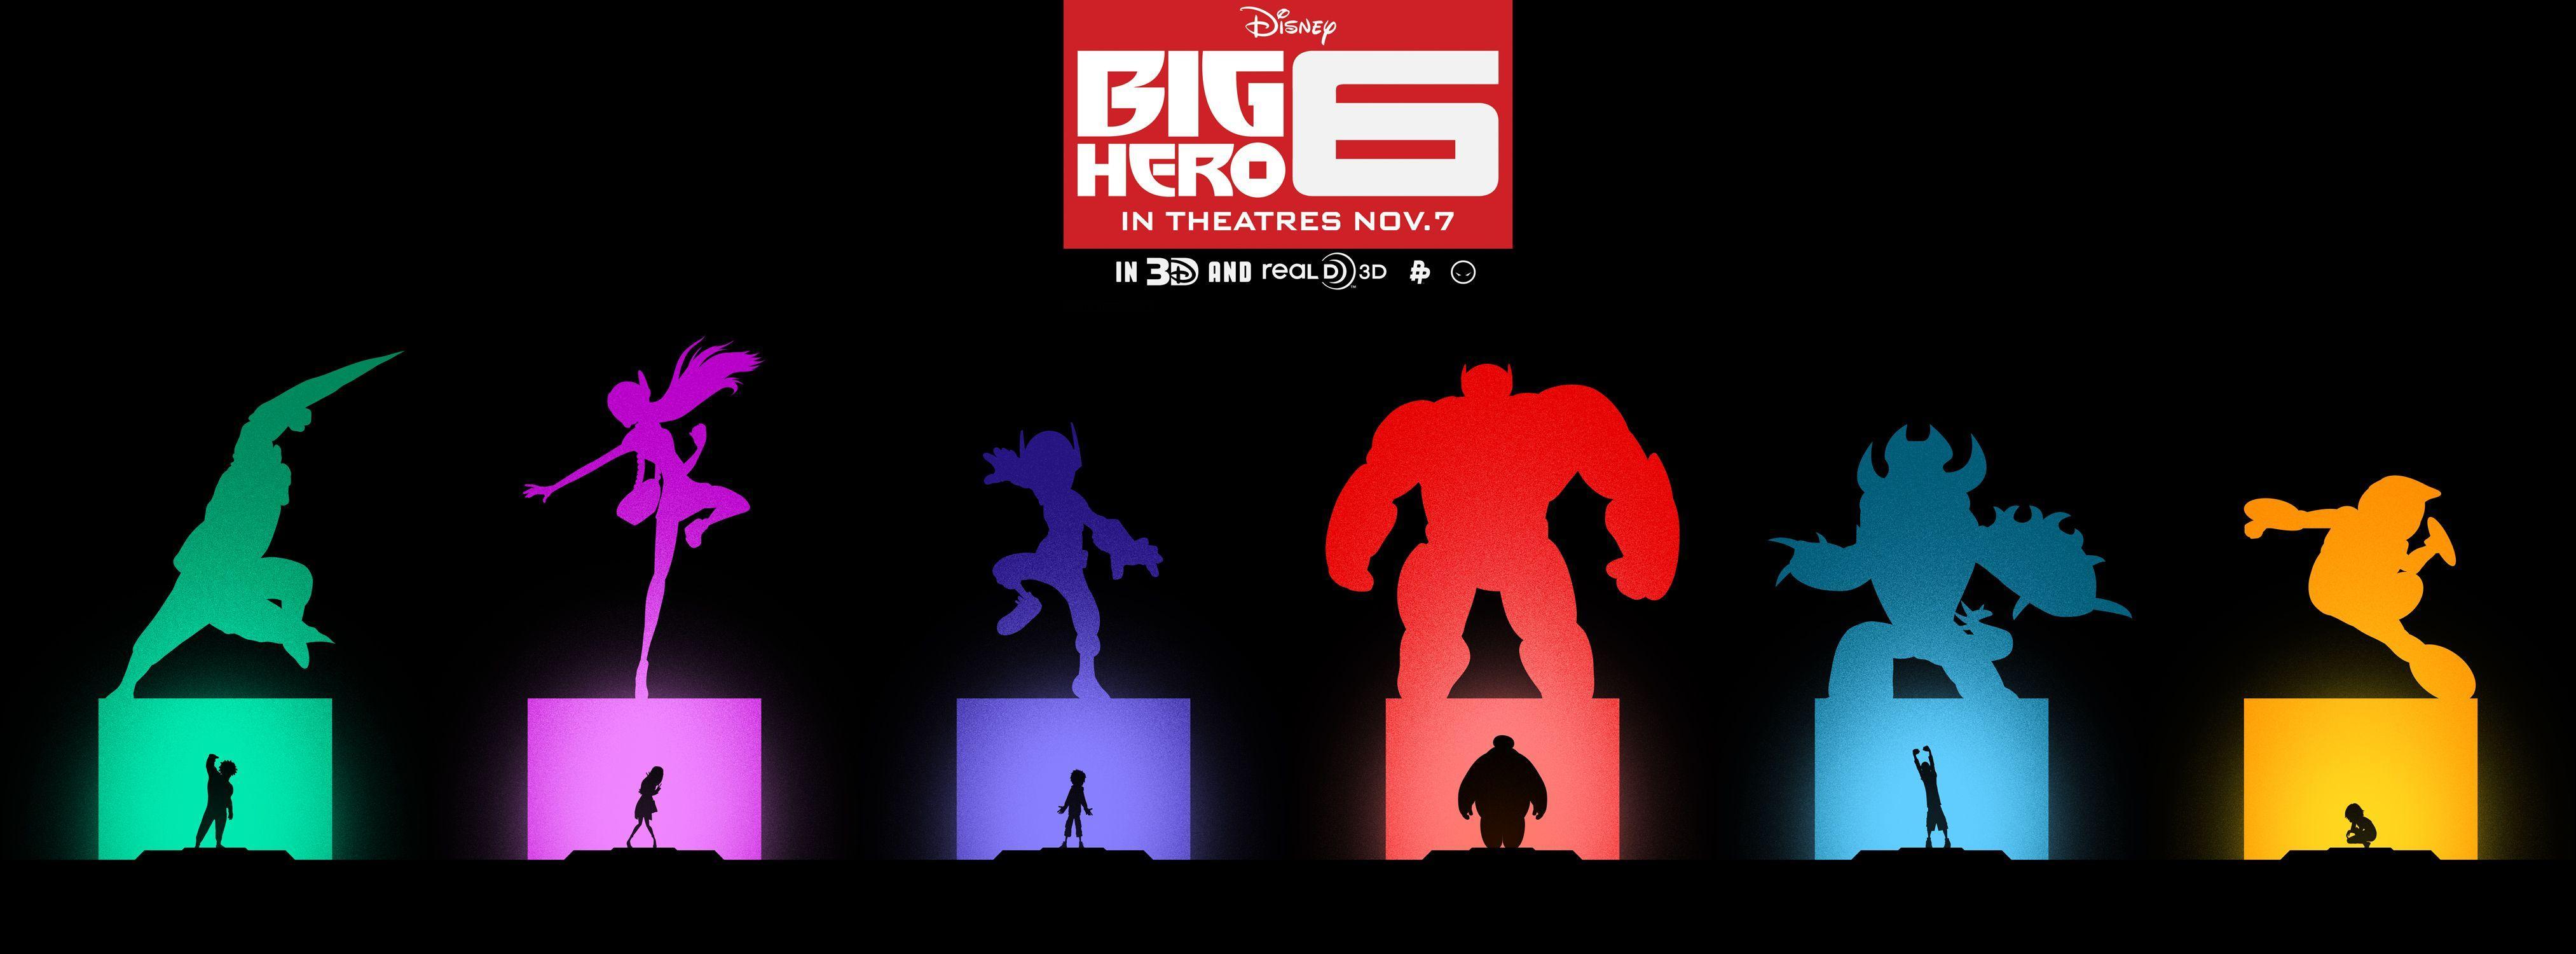 Big Hero 6 Wallpapers Wallpaper Cave